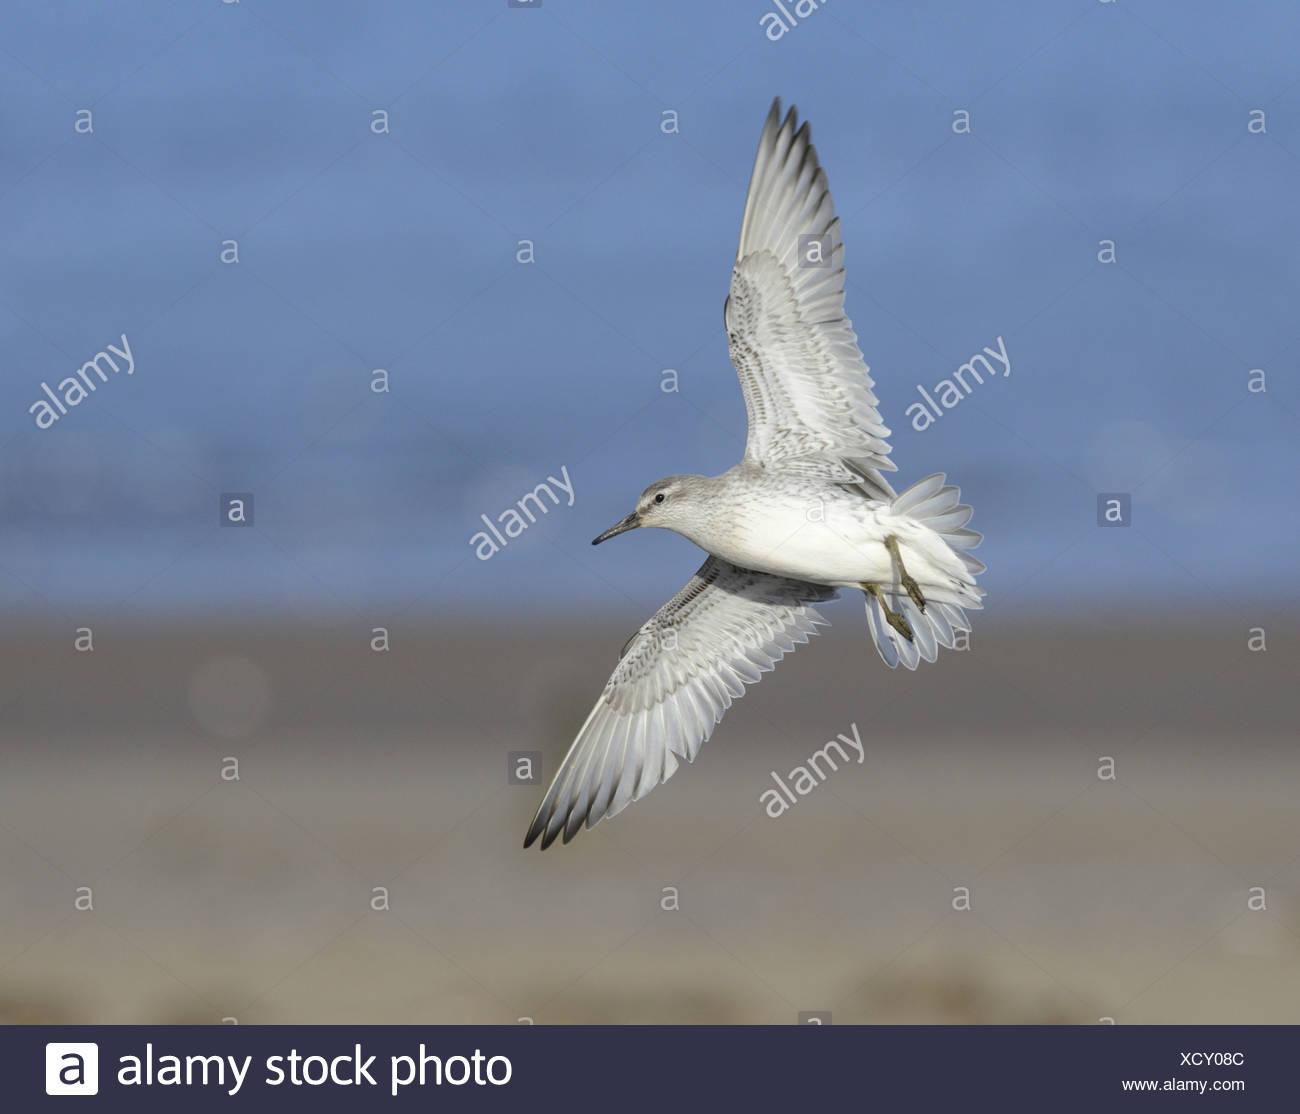 Knot Calidris canutus in flight - Stock Image